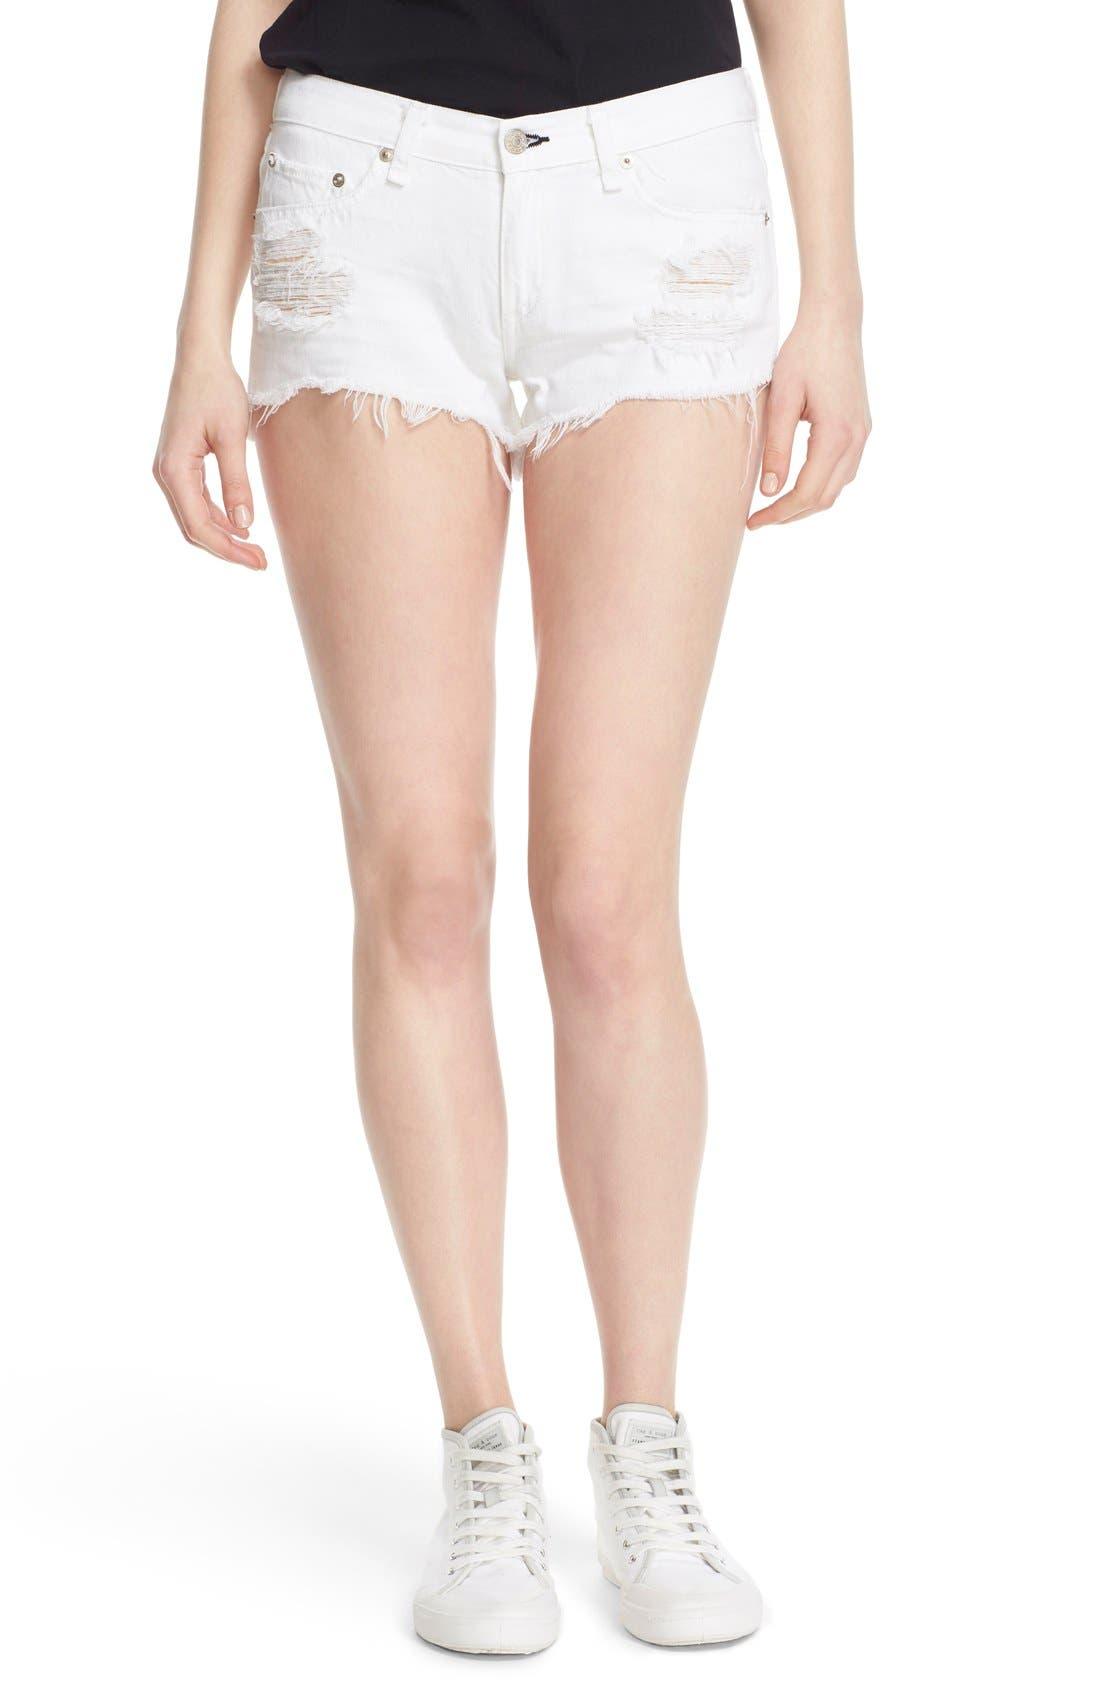 Alternate Image 1 Selected - rag & bone/JEAN Ripped Cutoff Denim Shorts